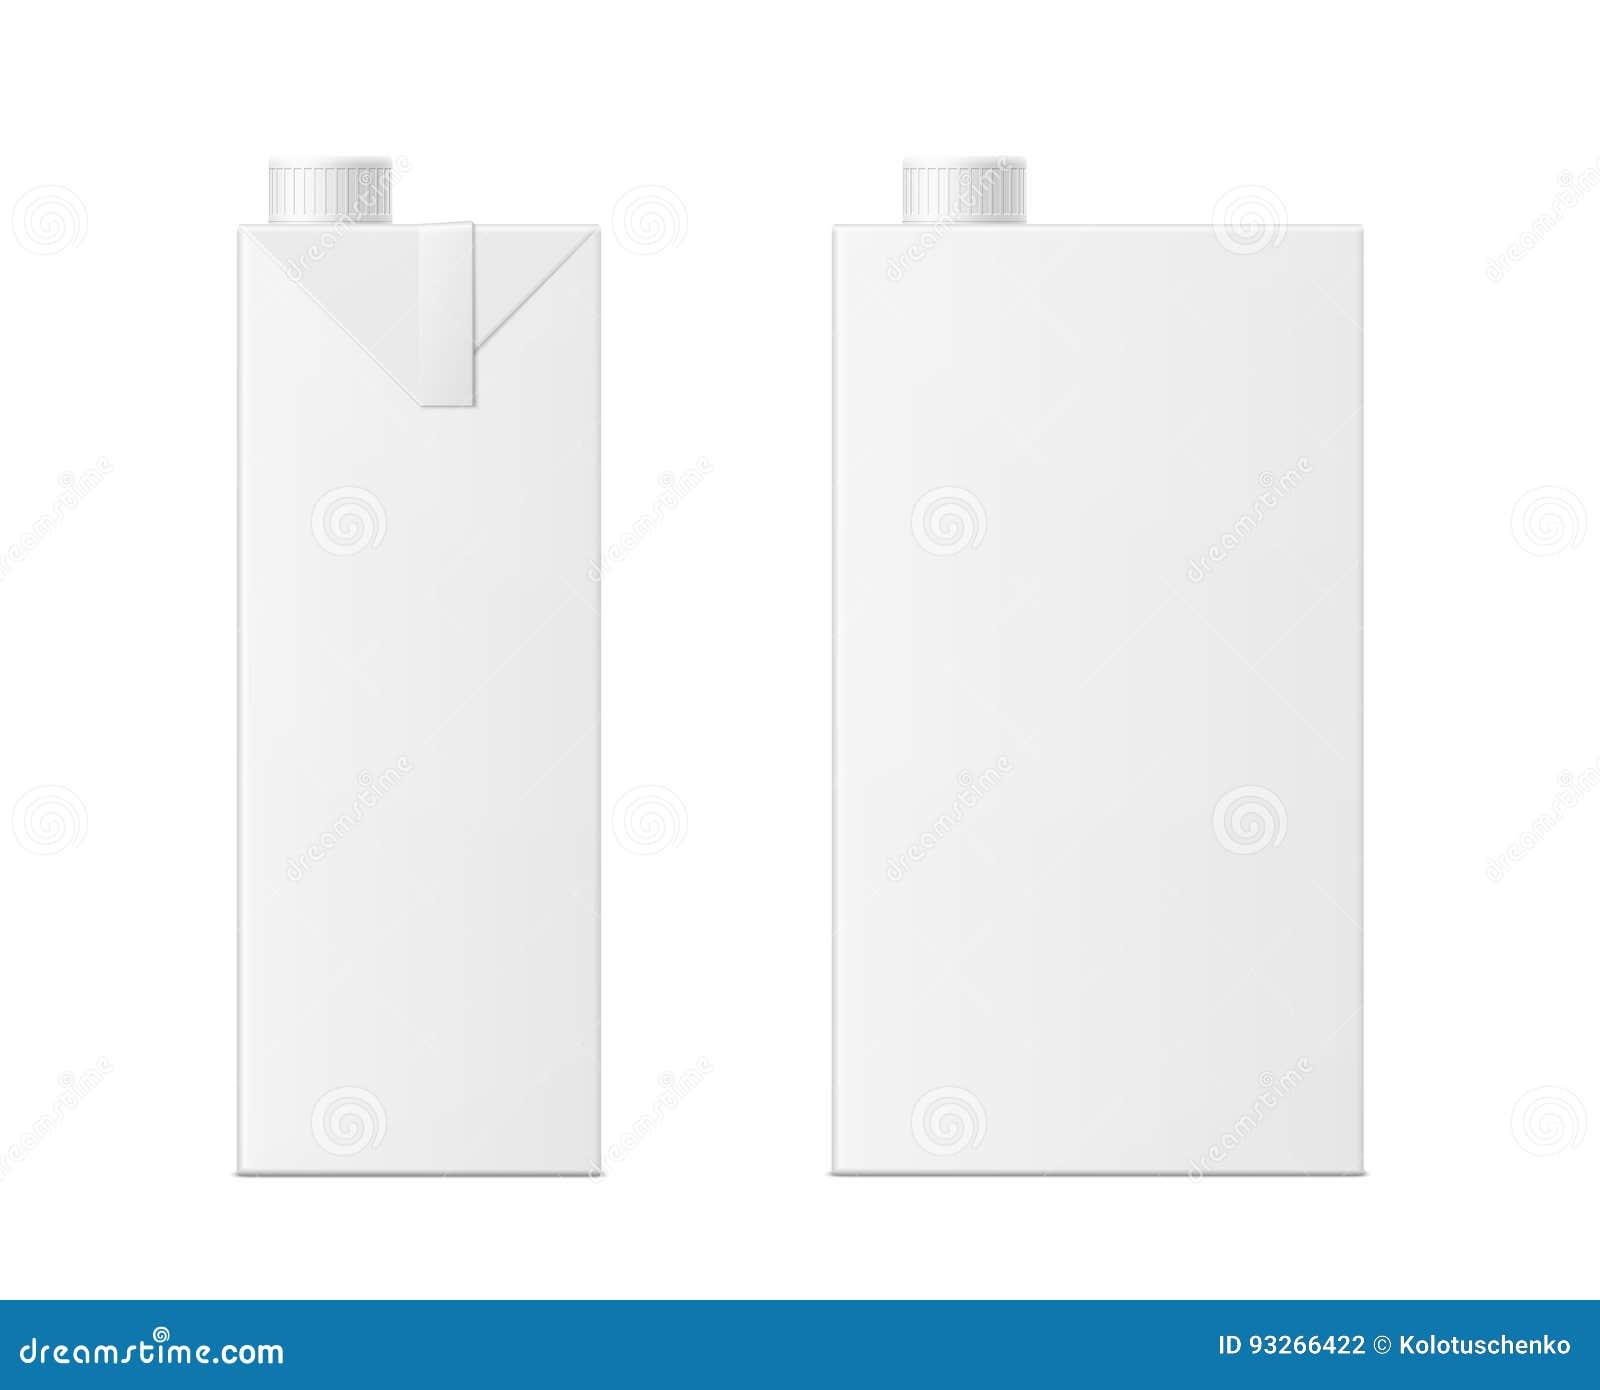 vector 3d mock up of milk or juice box stock vector illustration